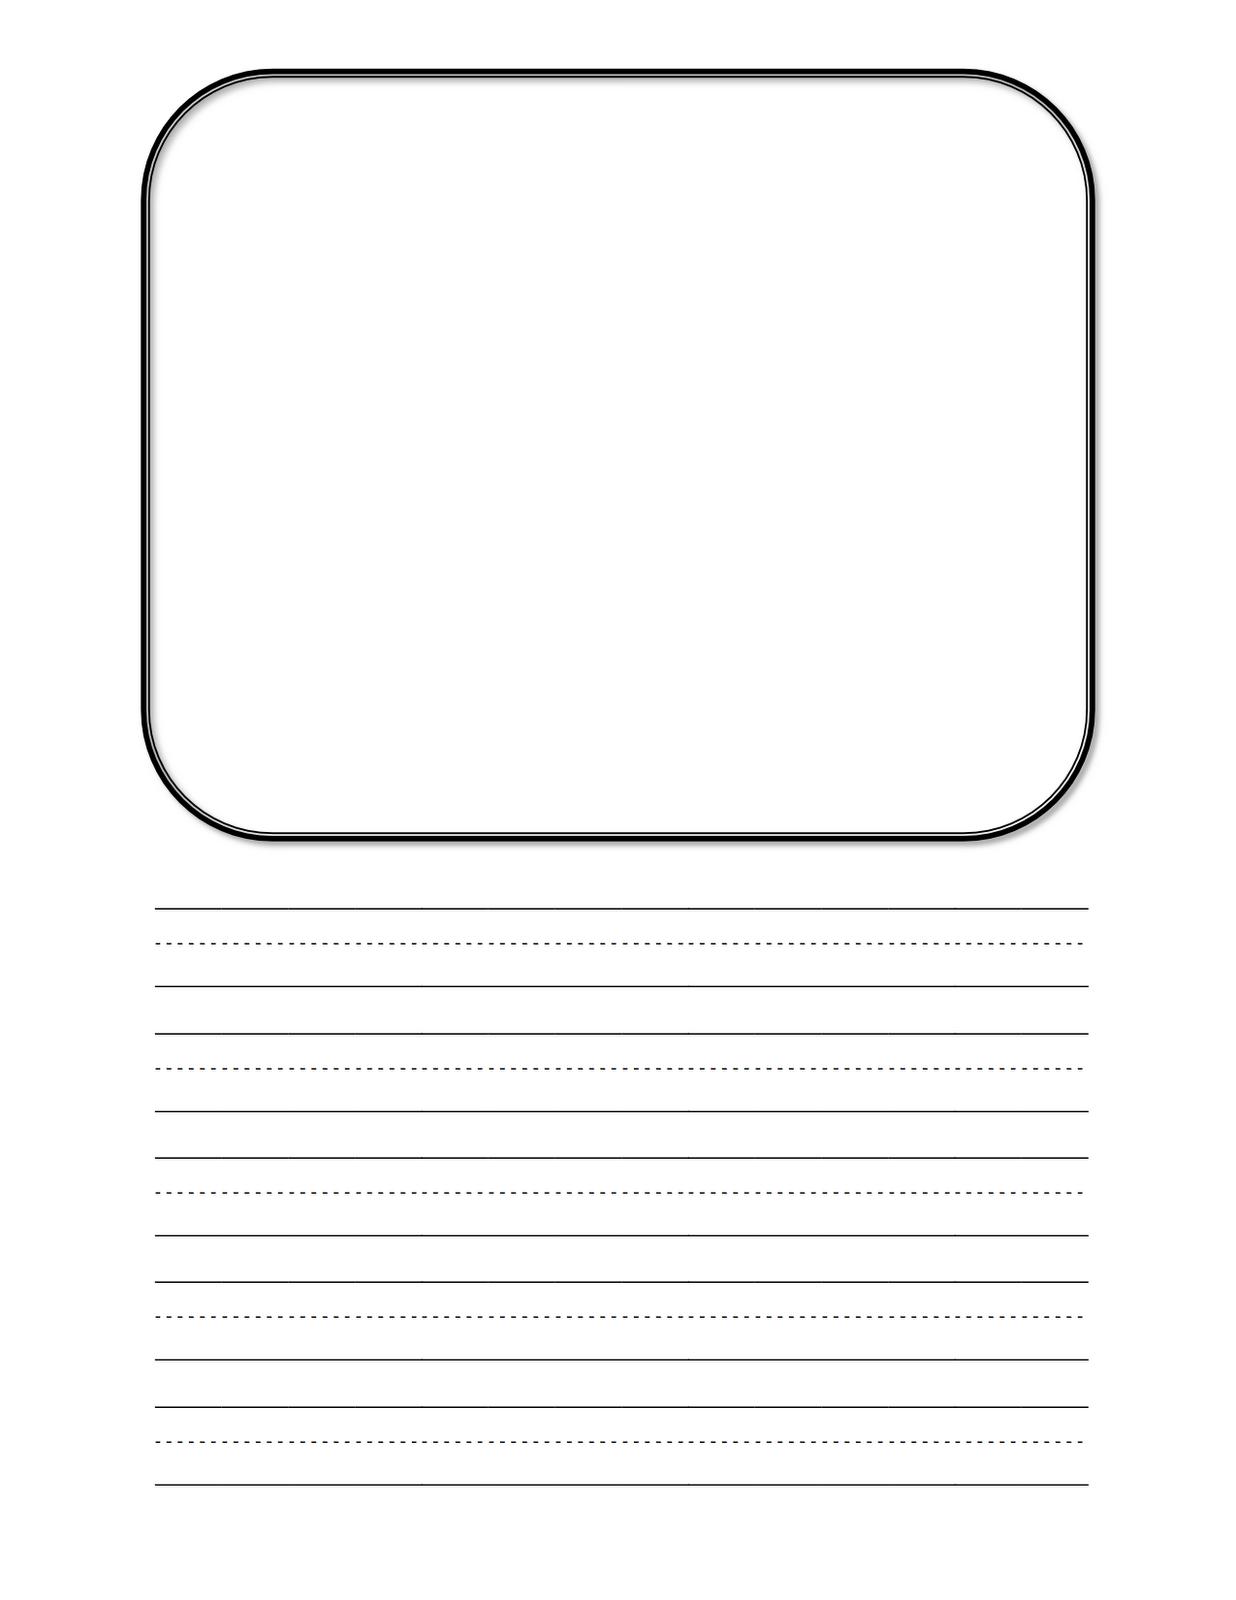 Worksheet Amazing Handwriting Worksheet Worksheet Fun